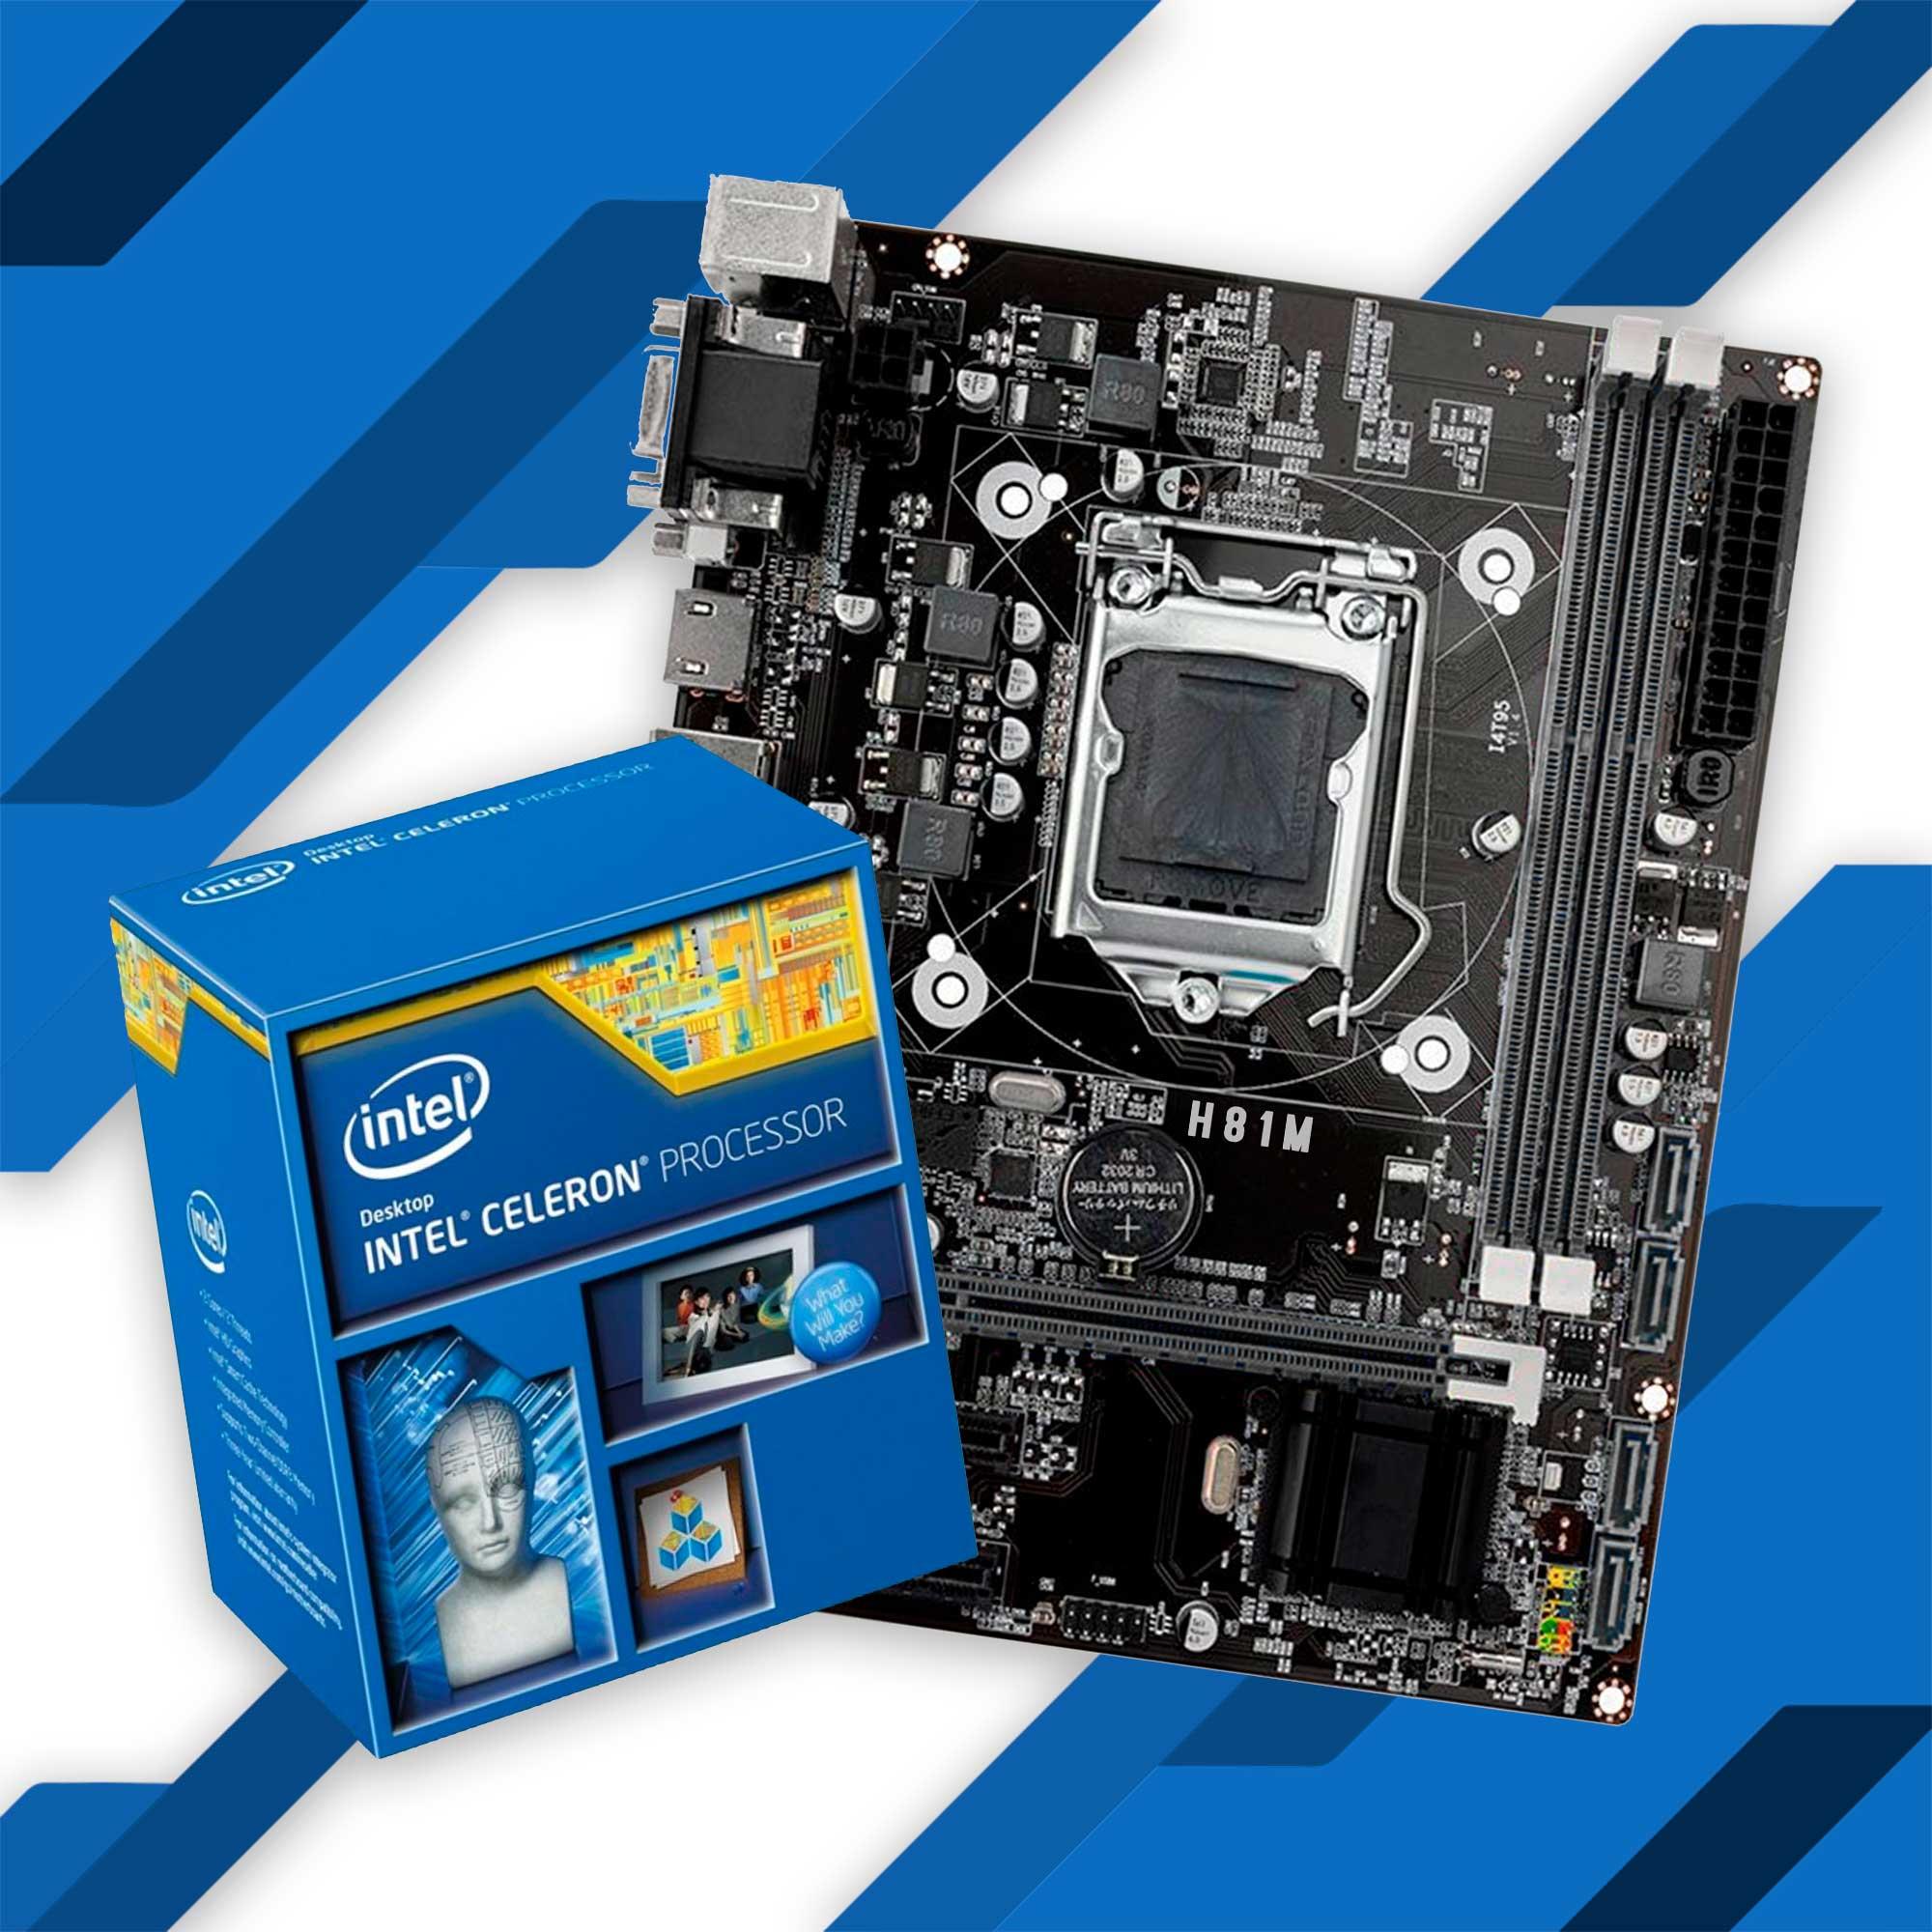 Kit Upgrade Intel Celeron 1820 + Placa mãe H81M HG4